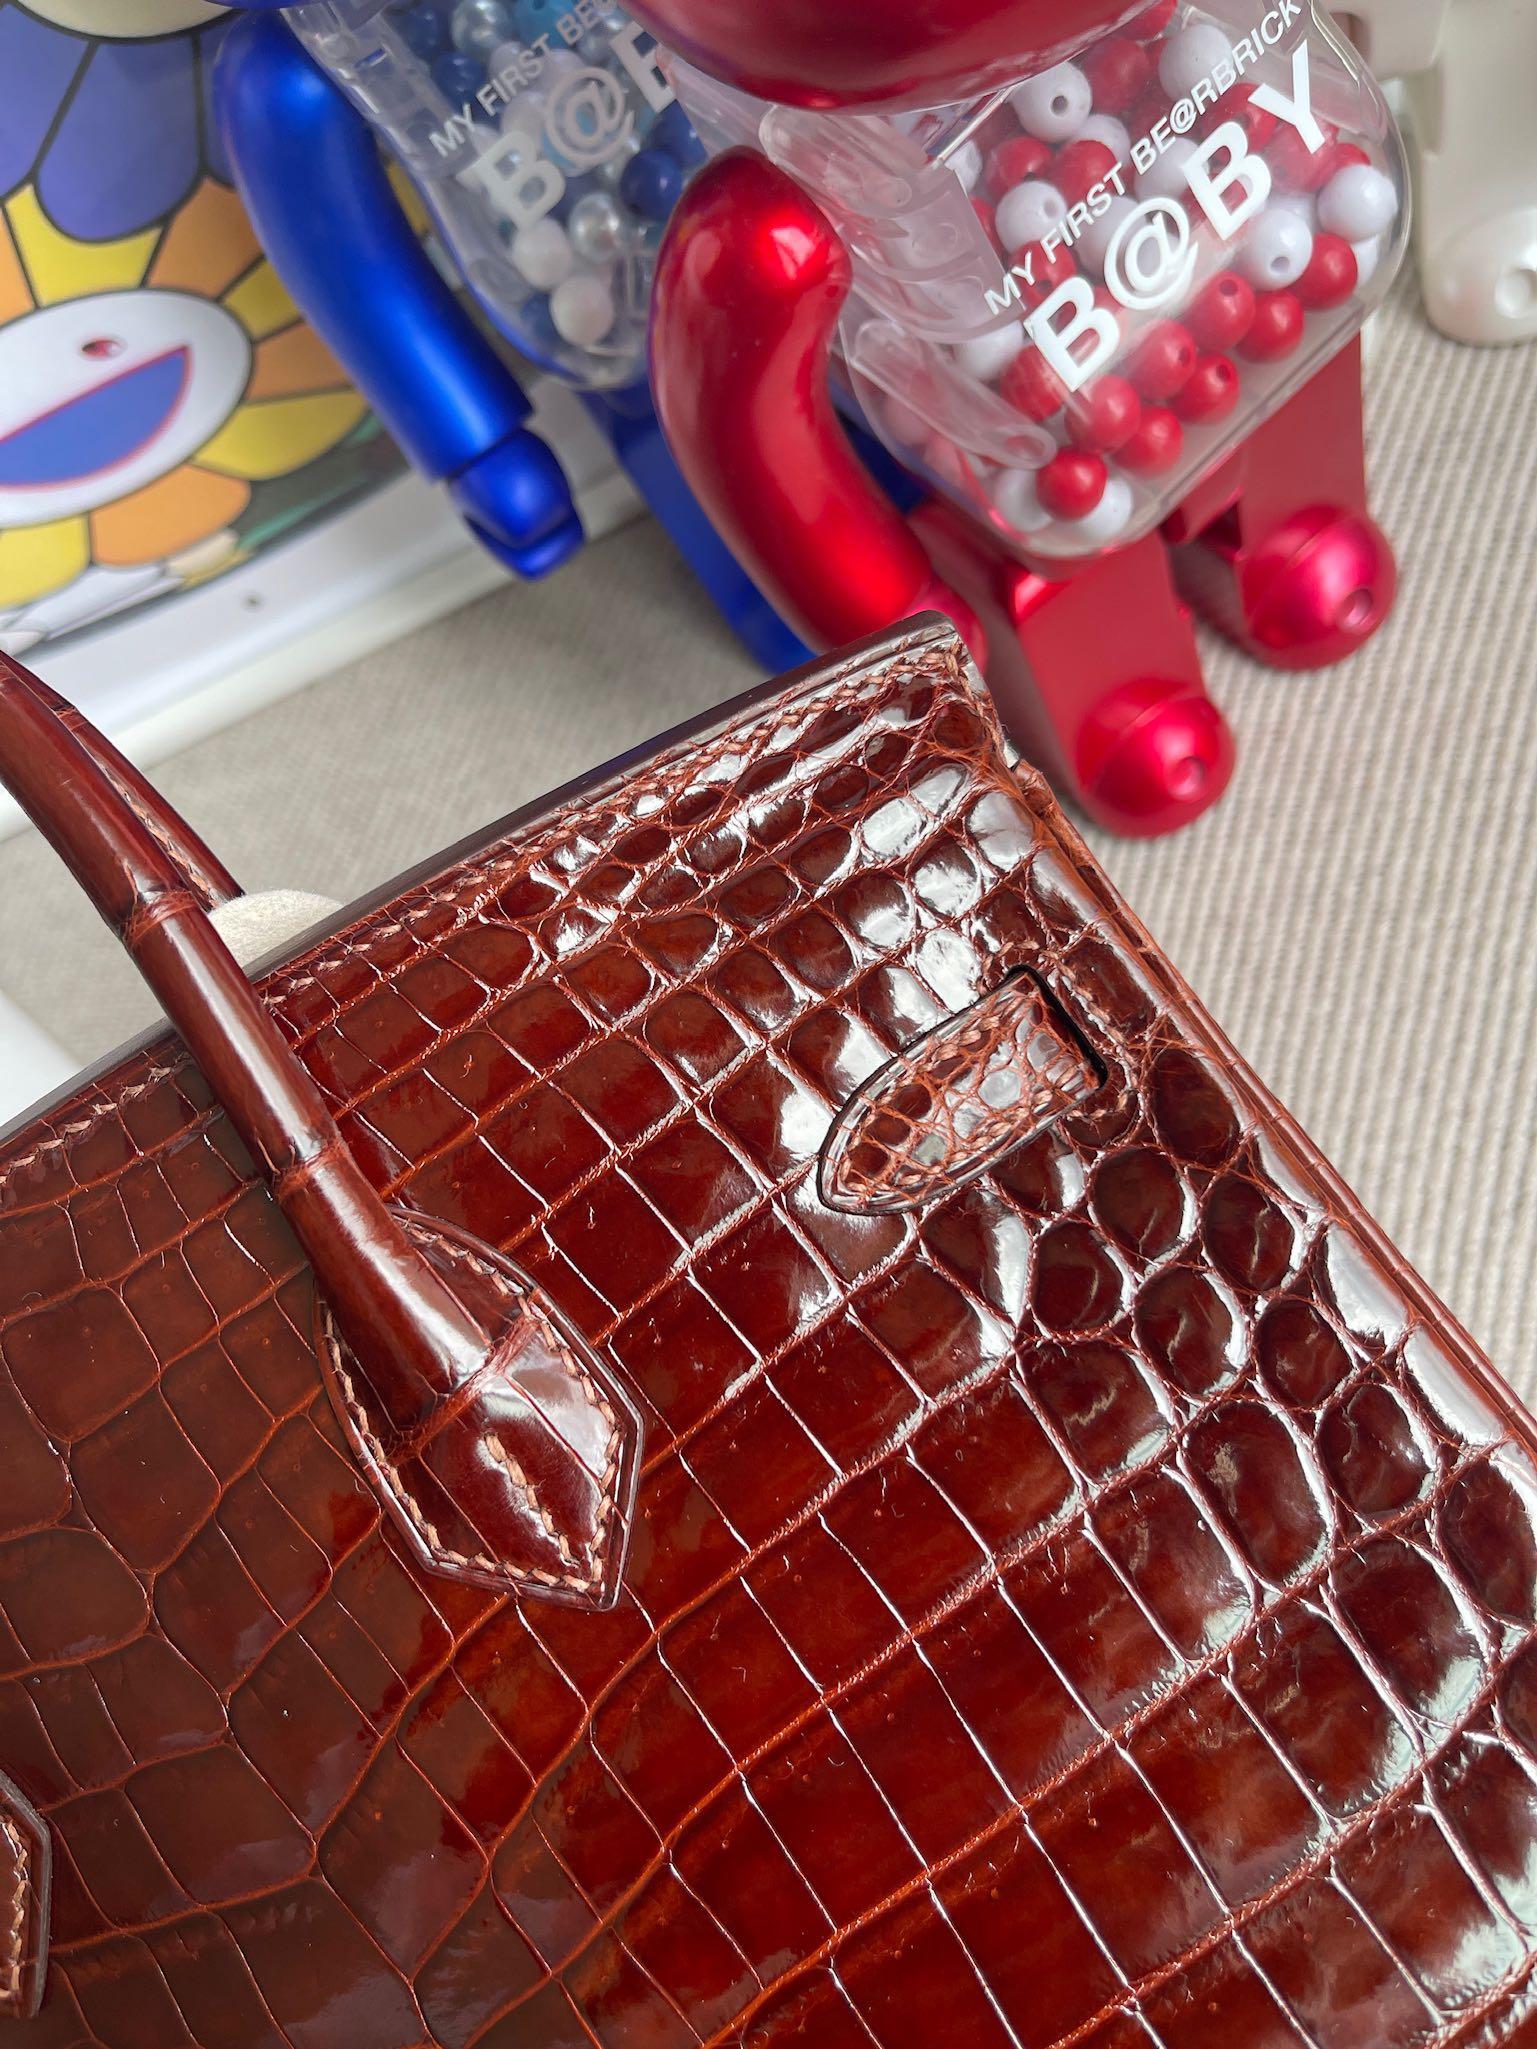 Hermès(爱马仕)Birkin 铂金包 Crocodile shiny 亮面鳄鱼 ck31 蜜糖棕 Miel 金扣 25cm 顶级手缝